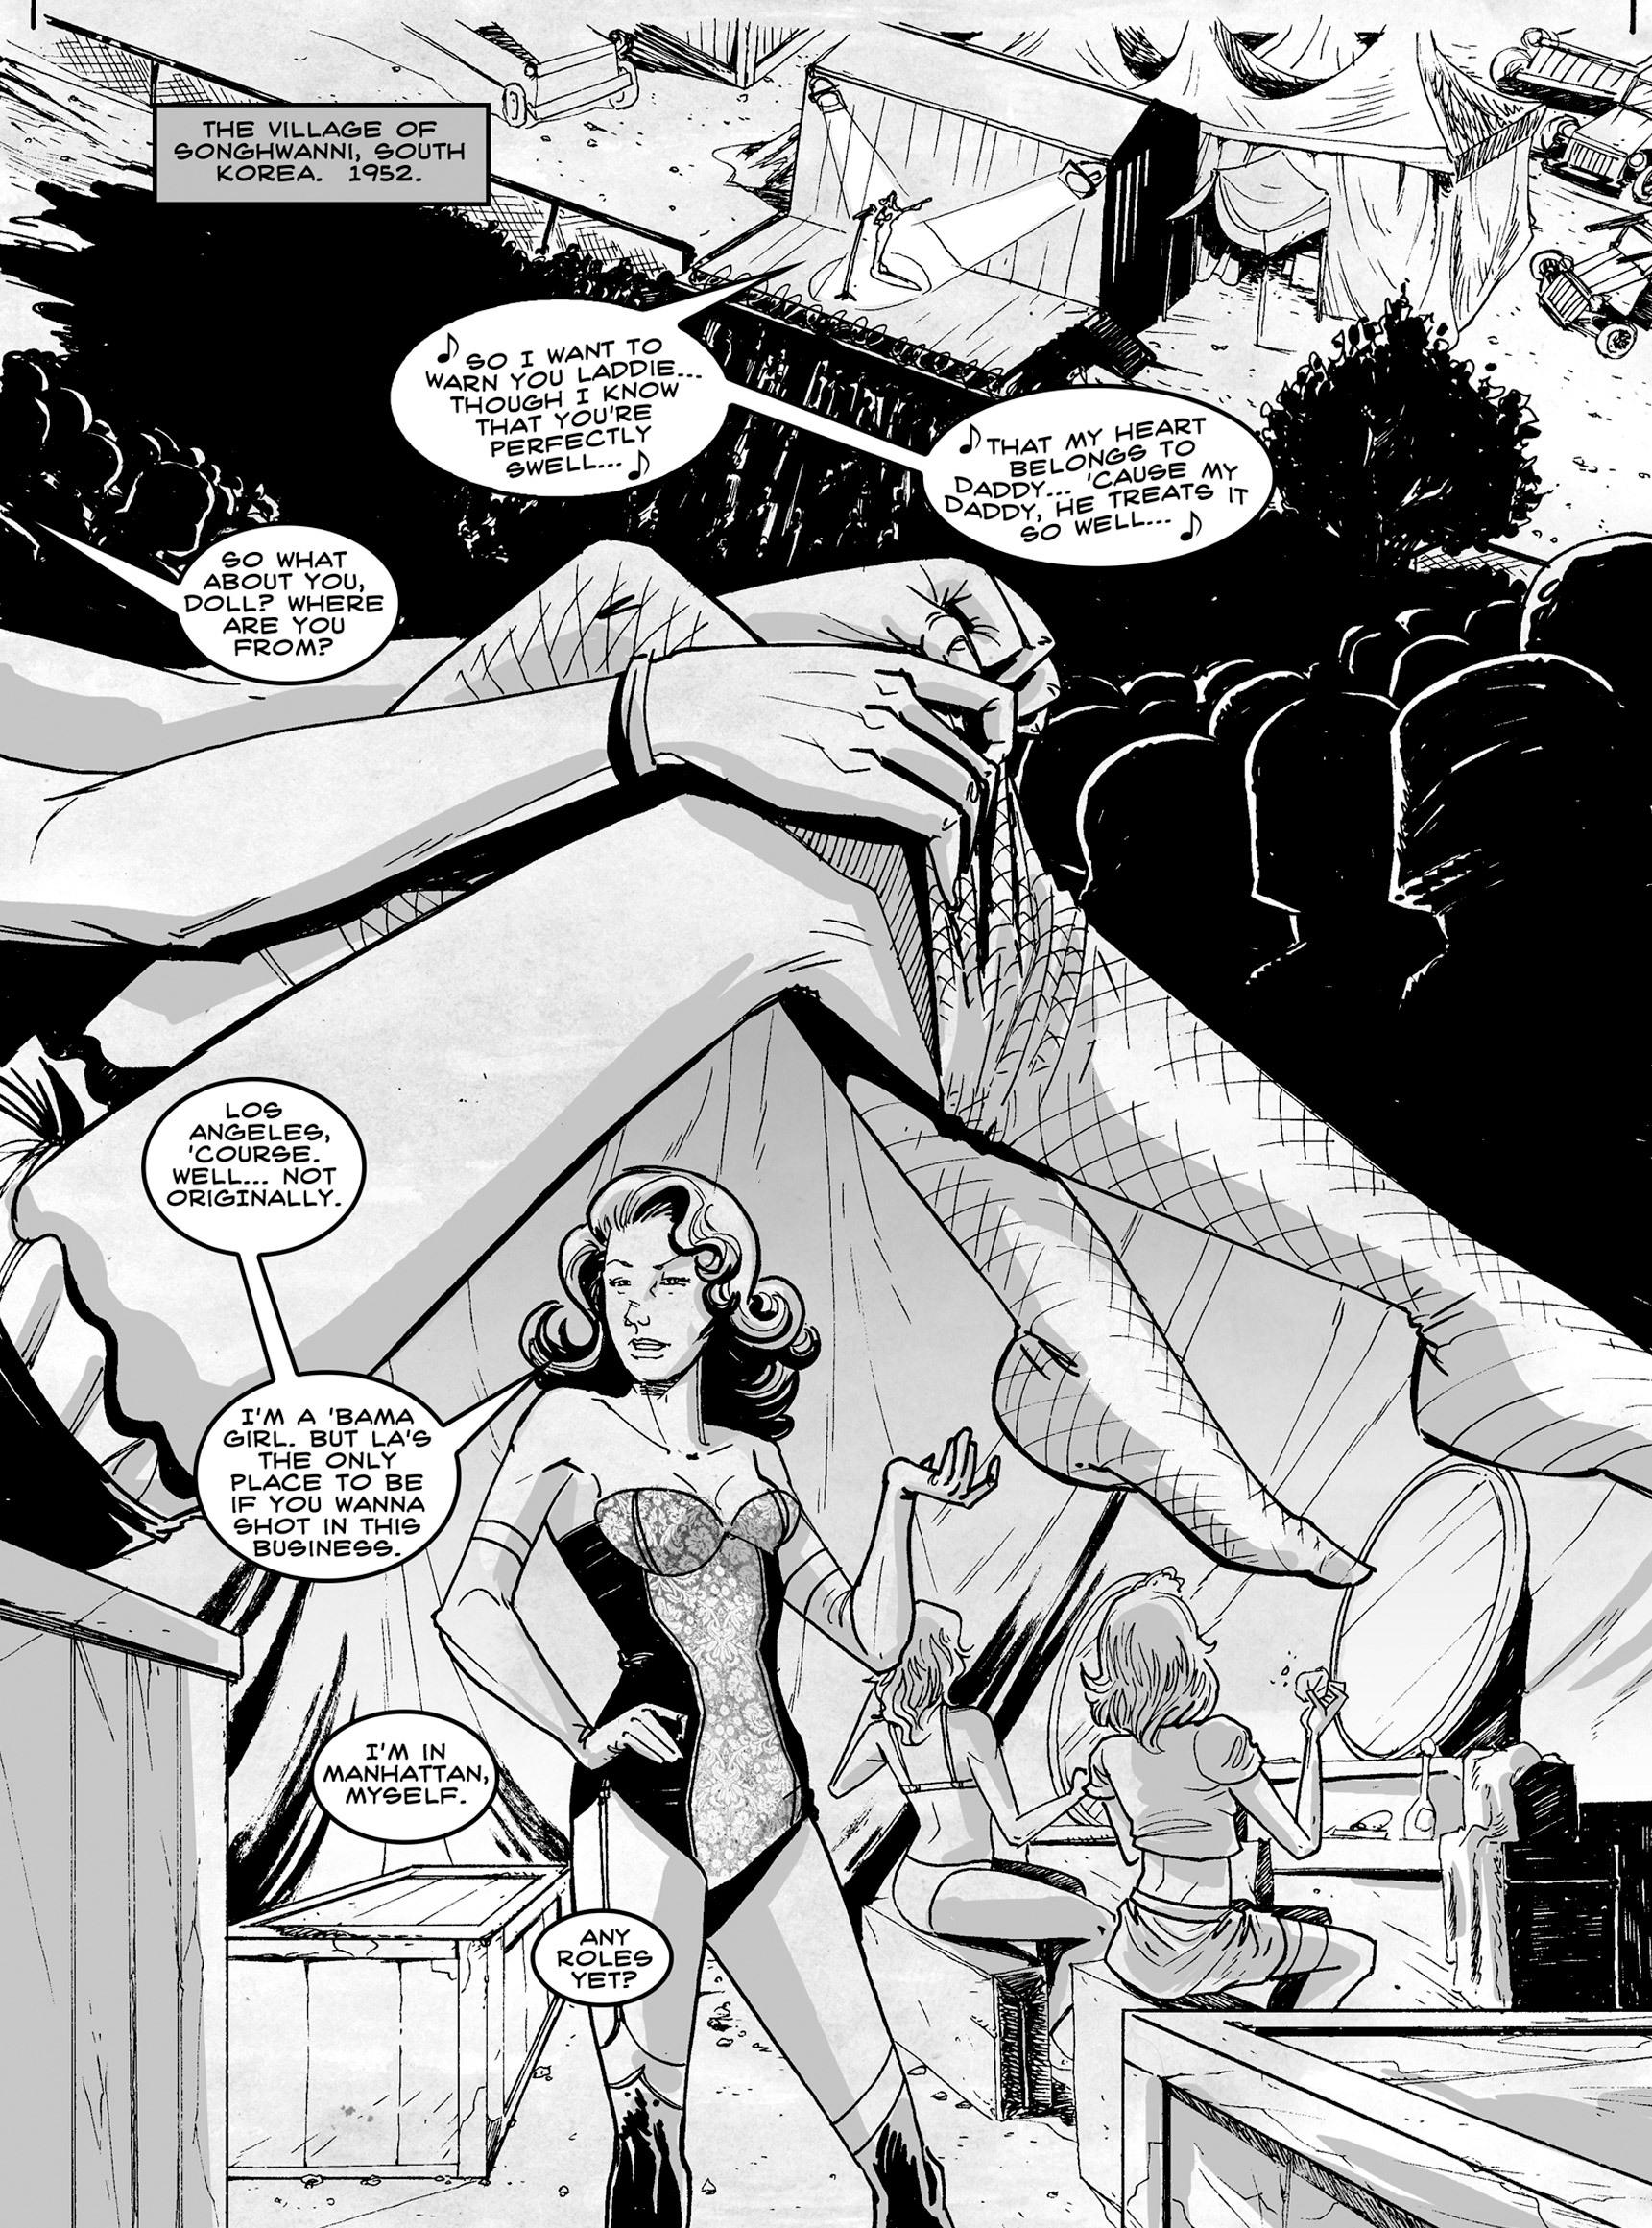 Read online FUBAR comic -  Issue #3 - 306